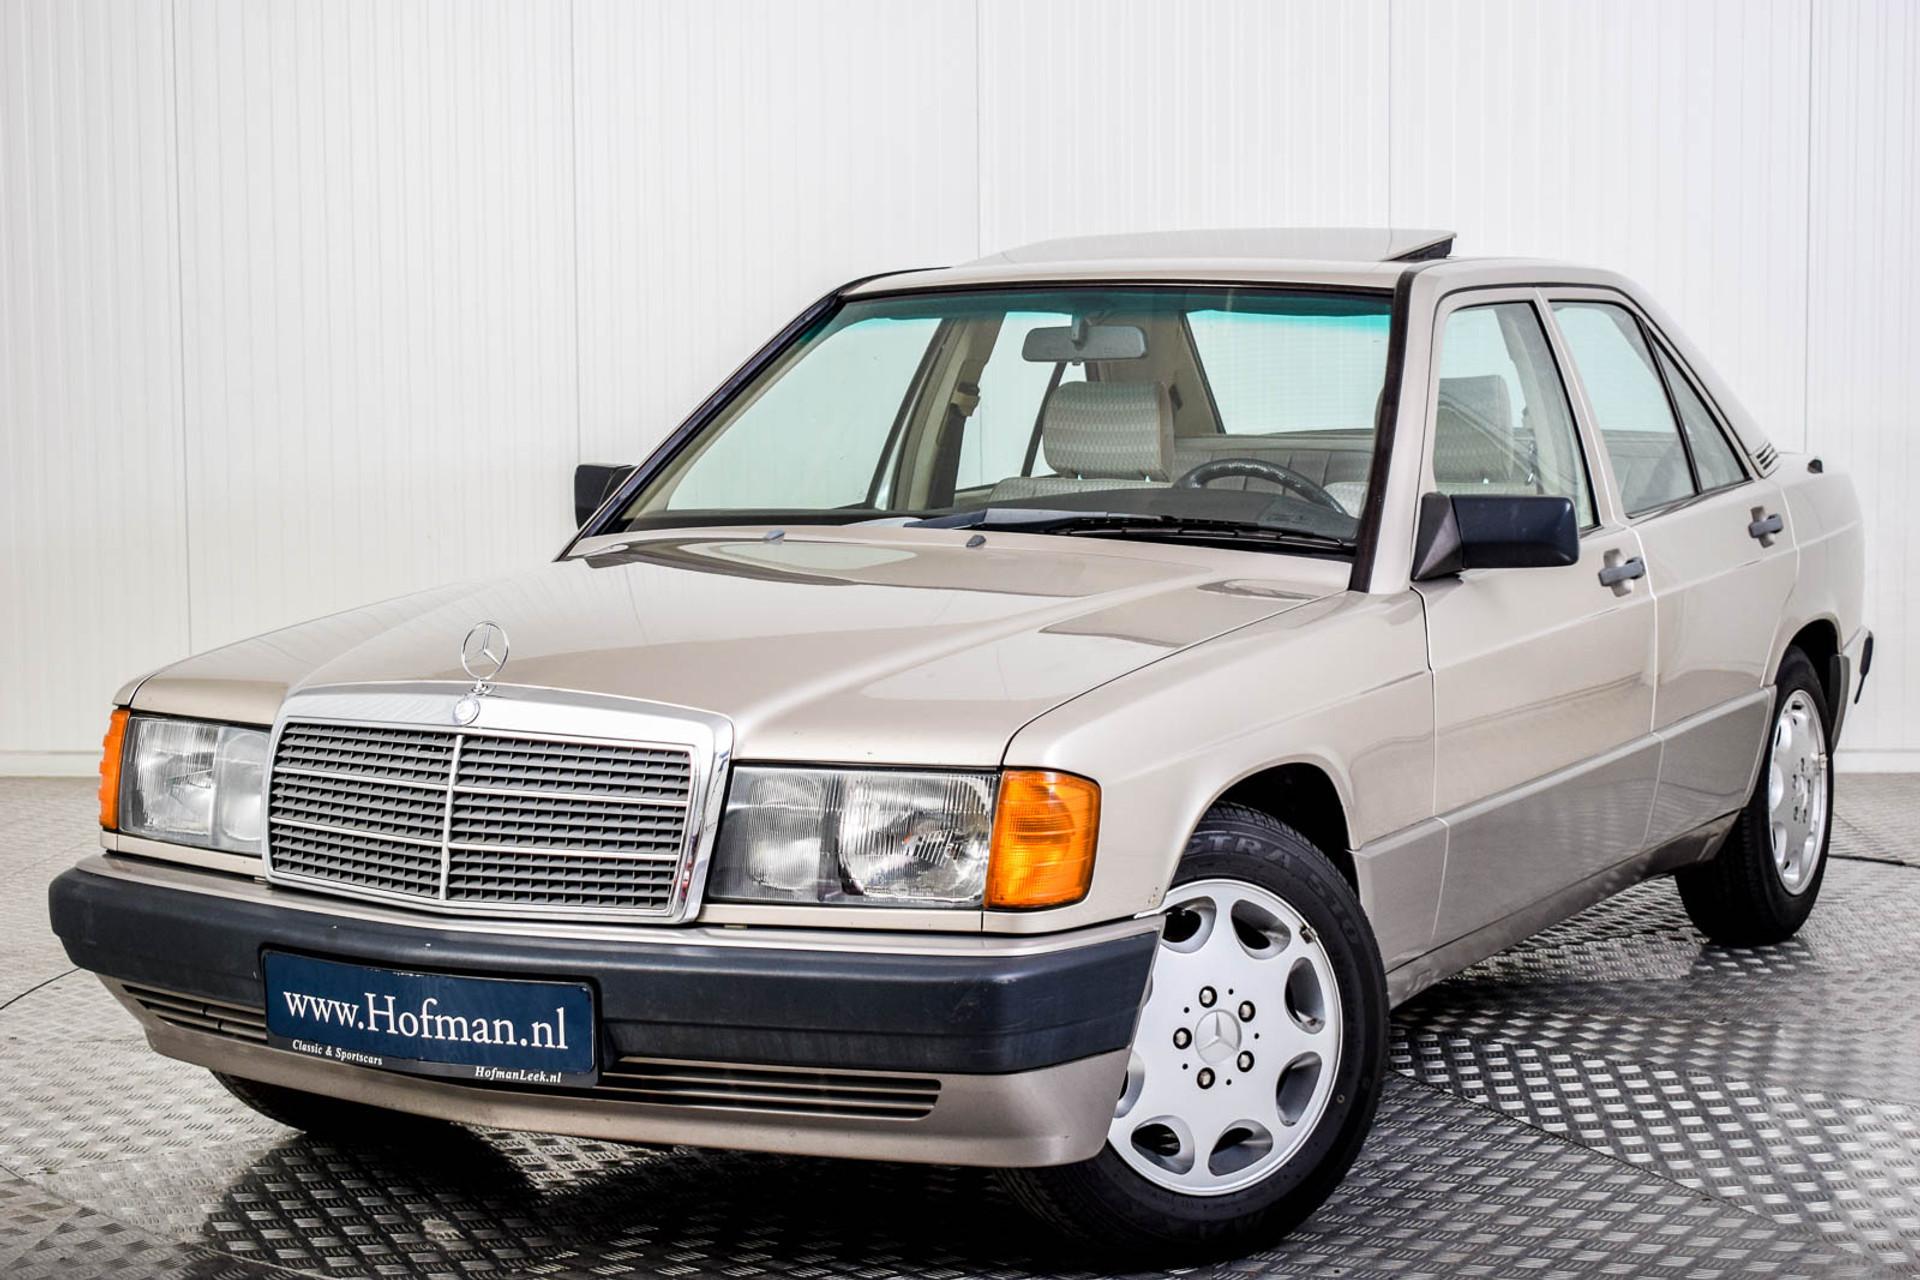 Mercedes-Benz 190 2.5 D Turbo Diesel Foto 18